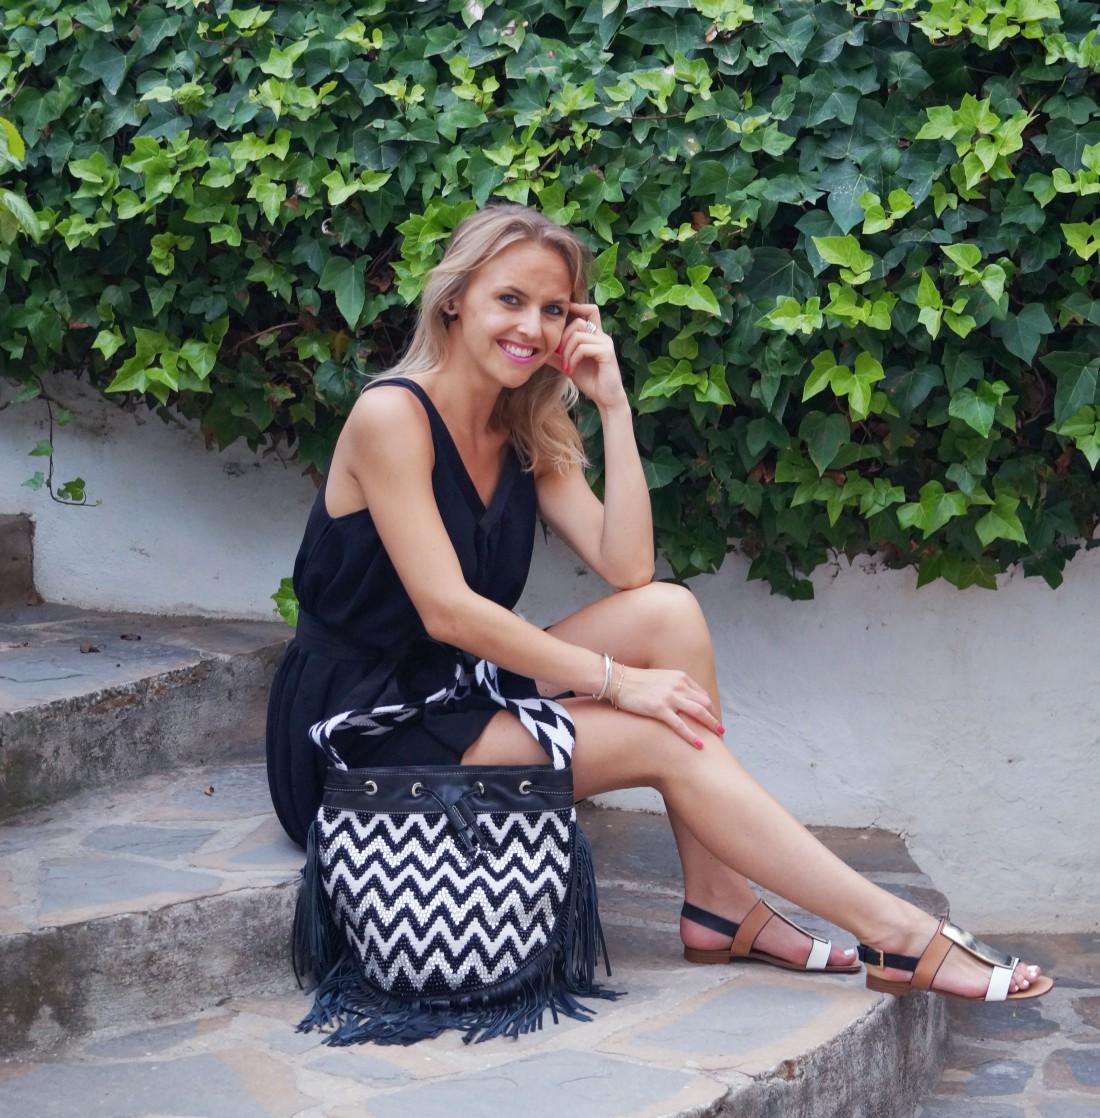 Bag at You - Fashion blog - Wayuu Colombia - Mochila Bag La Bendicion - Pure beauty